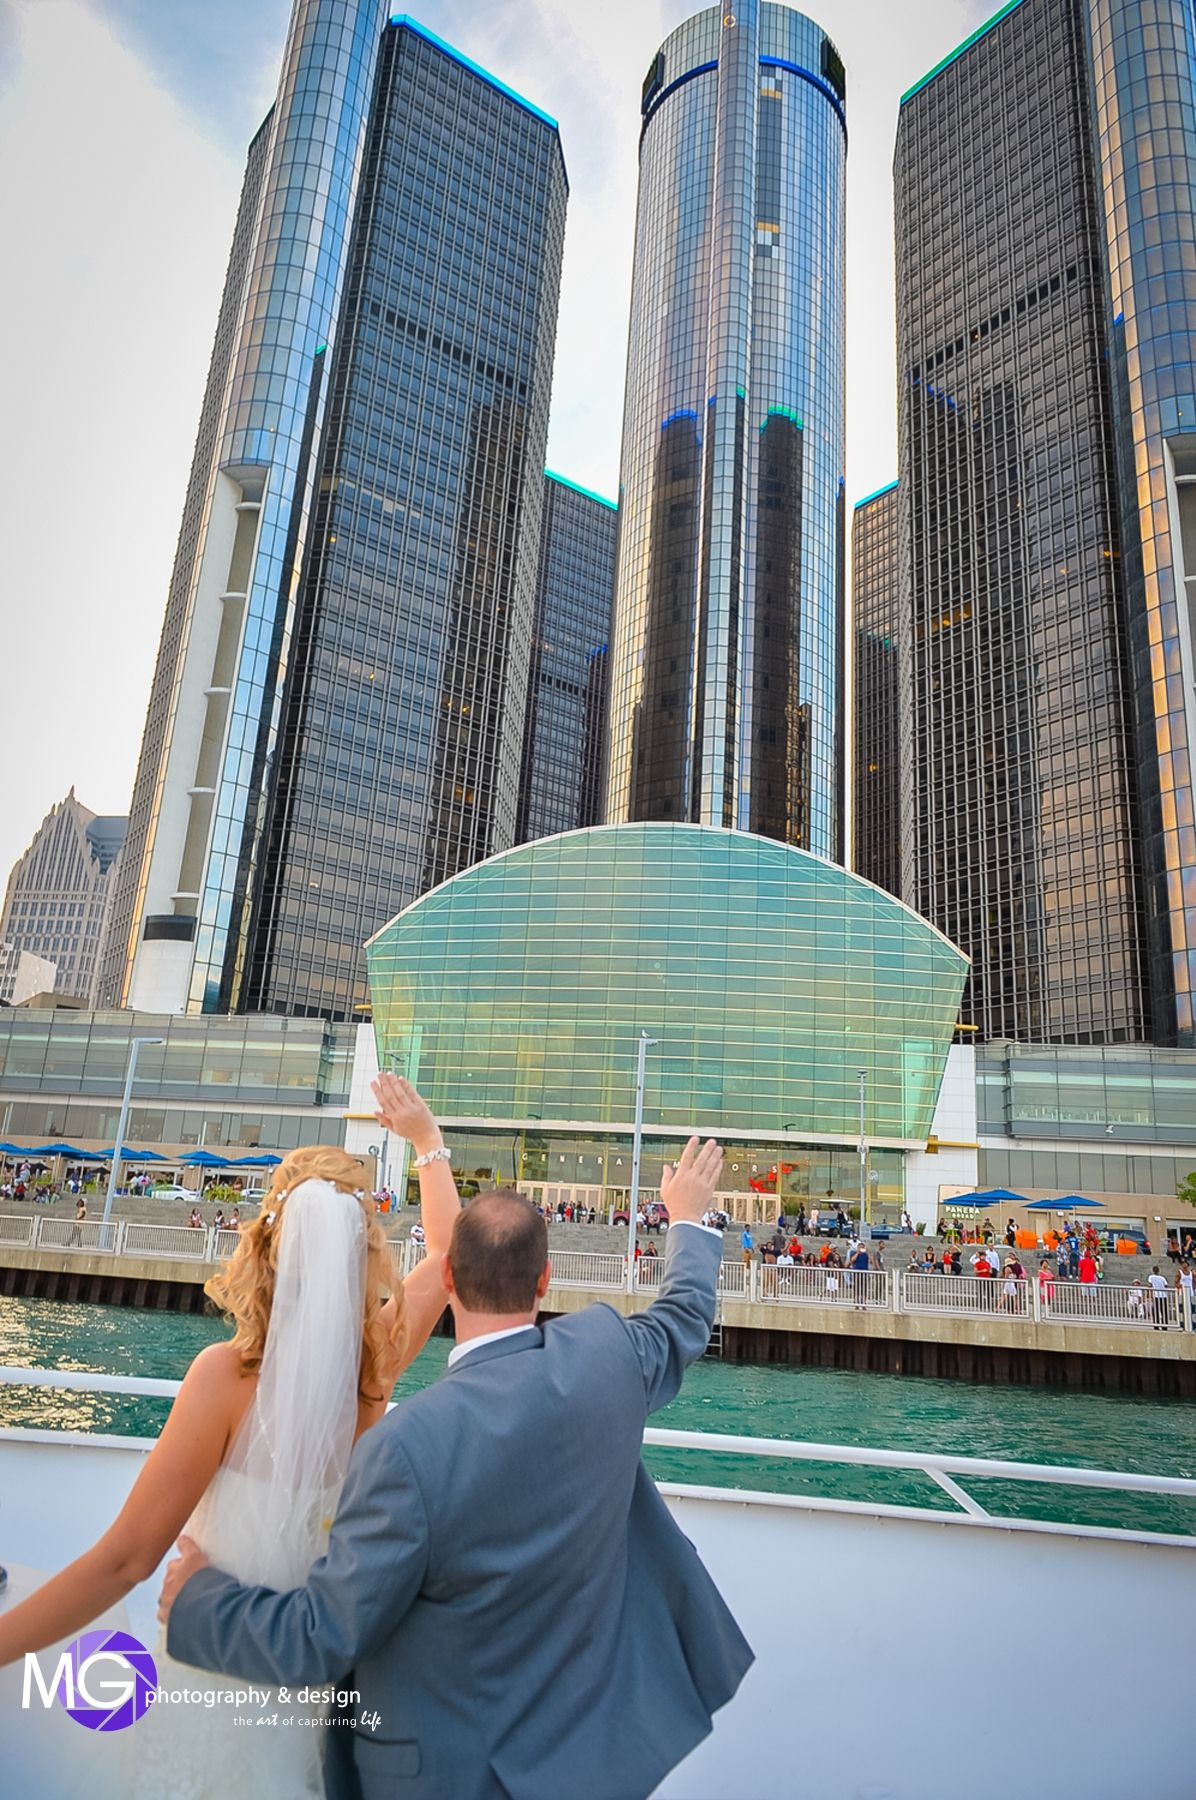 Wedding Venue In Detroit Michigan Infintiy & Ovation